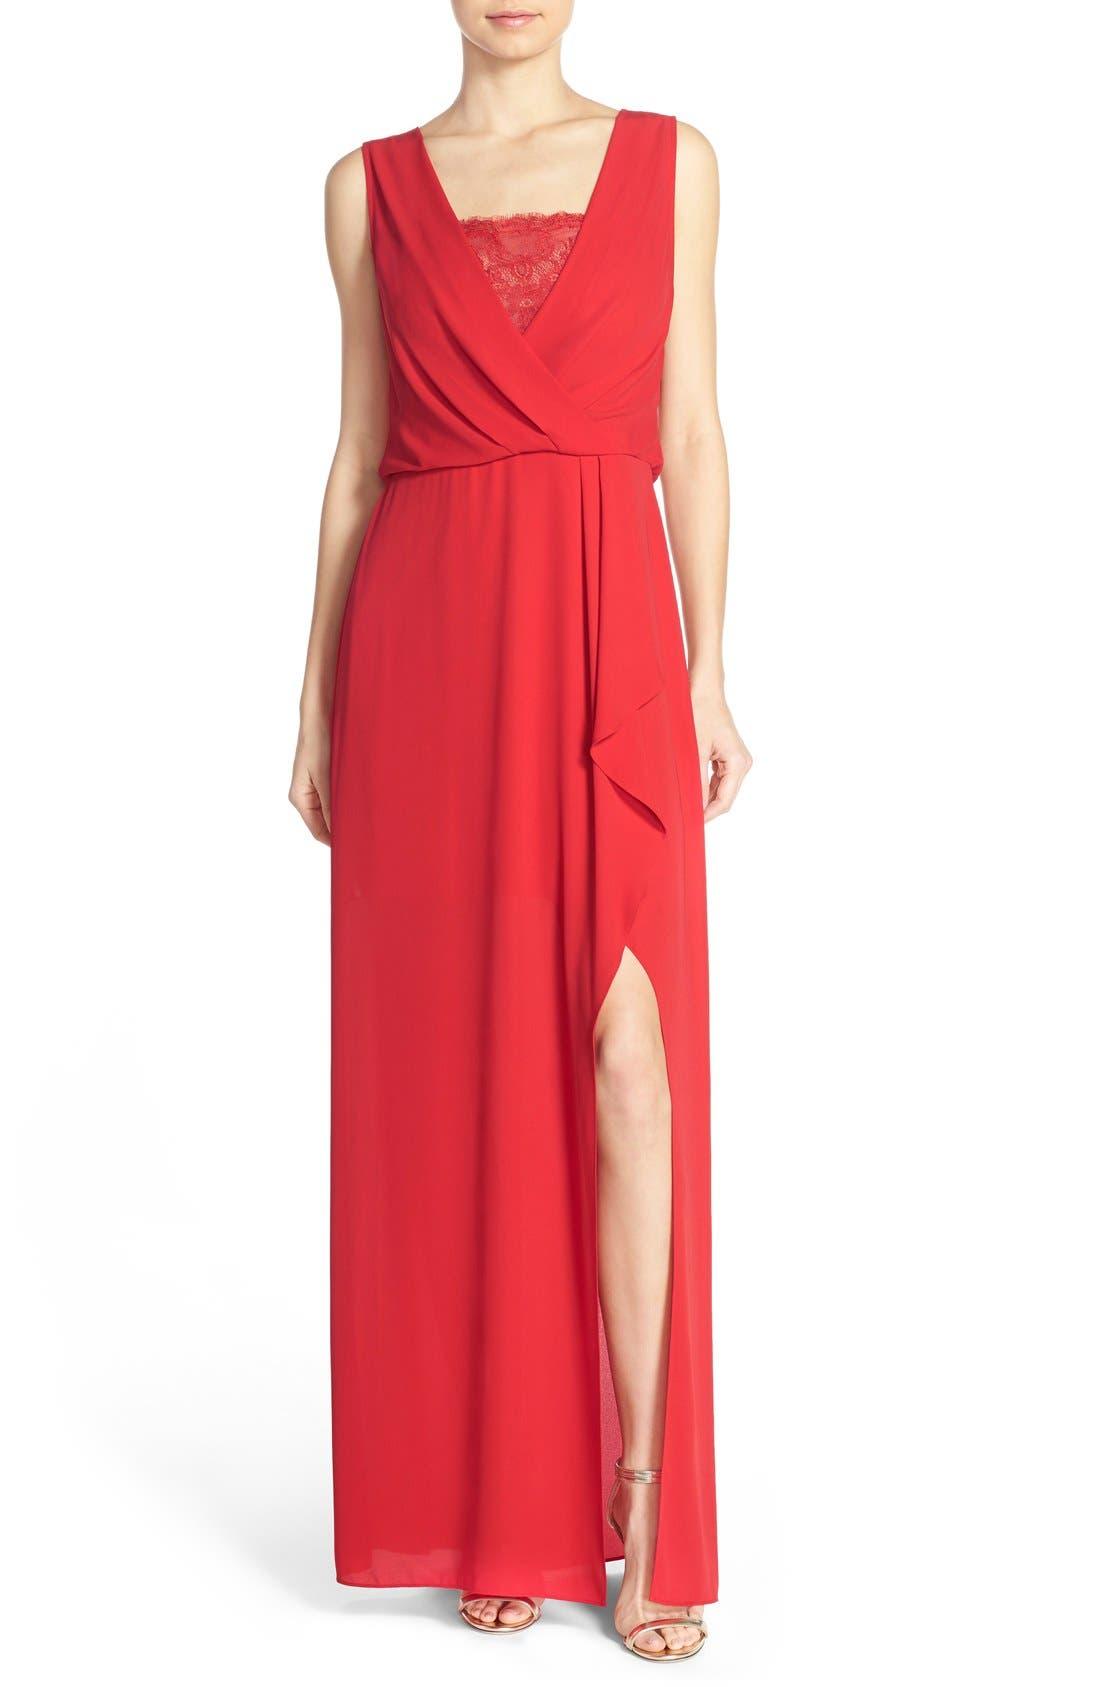 Alternate Image 1 Selected - BCBGMAXAZRIA Georgette Blouson Gown